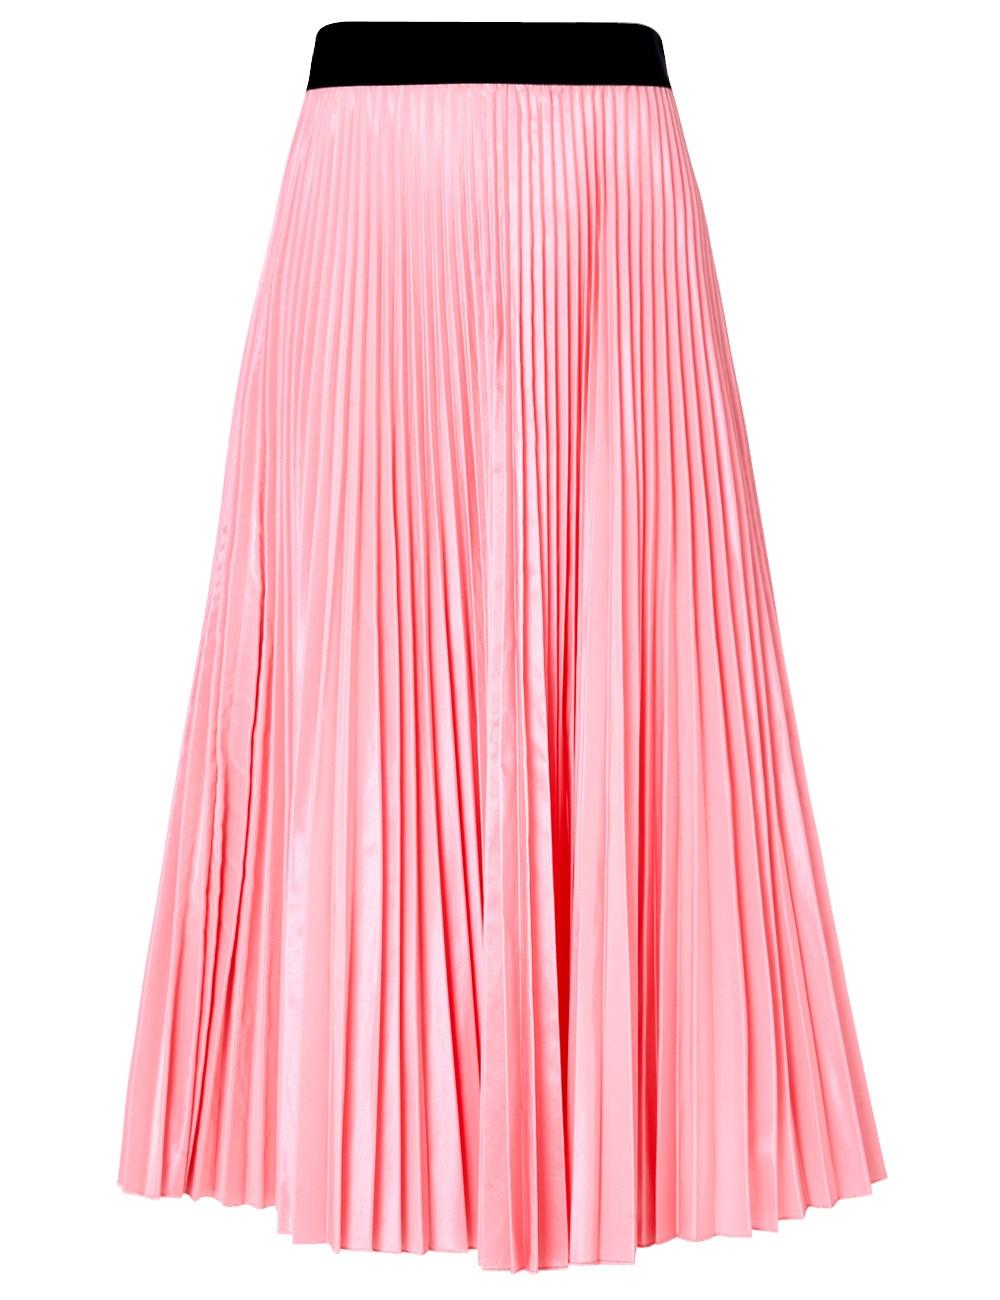 accordion pleated skirt redskirtz